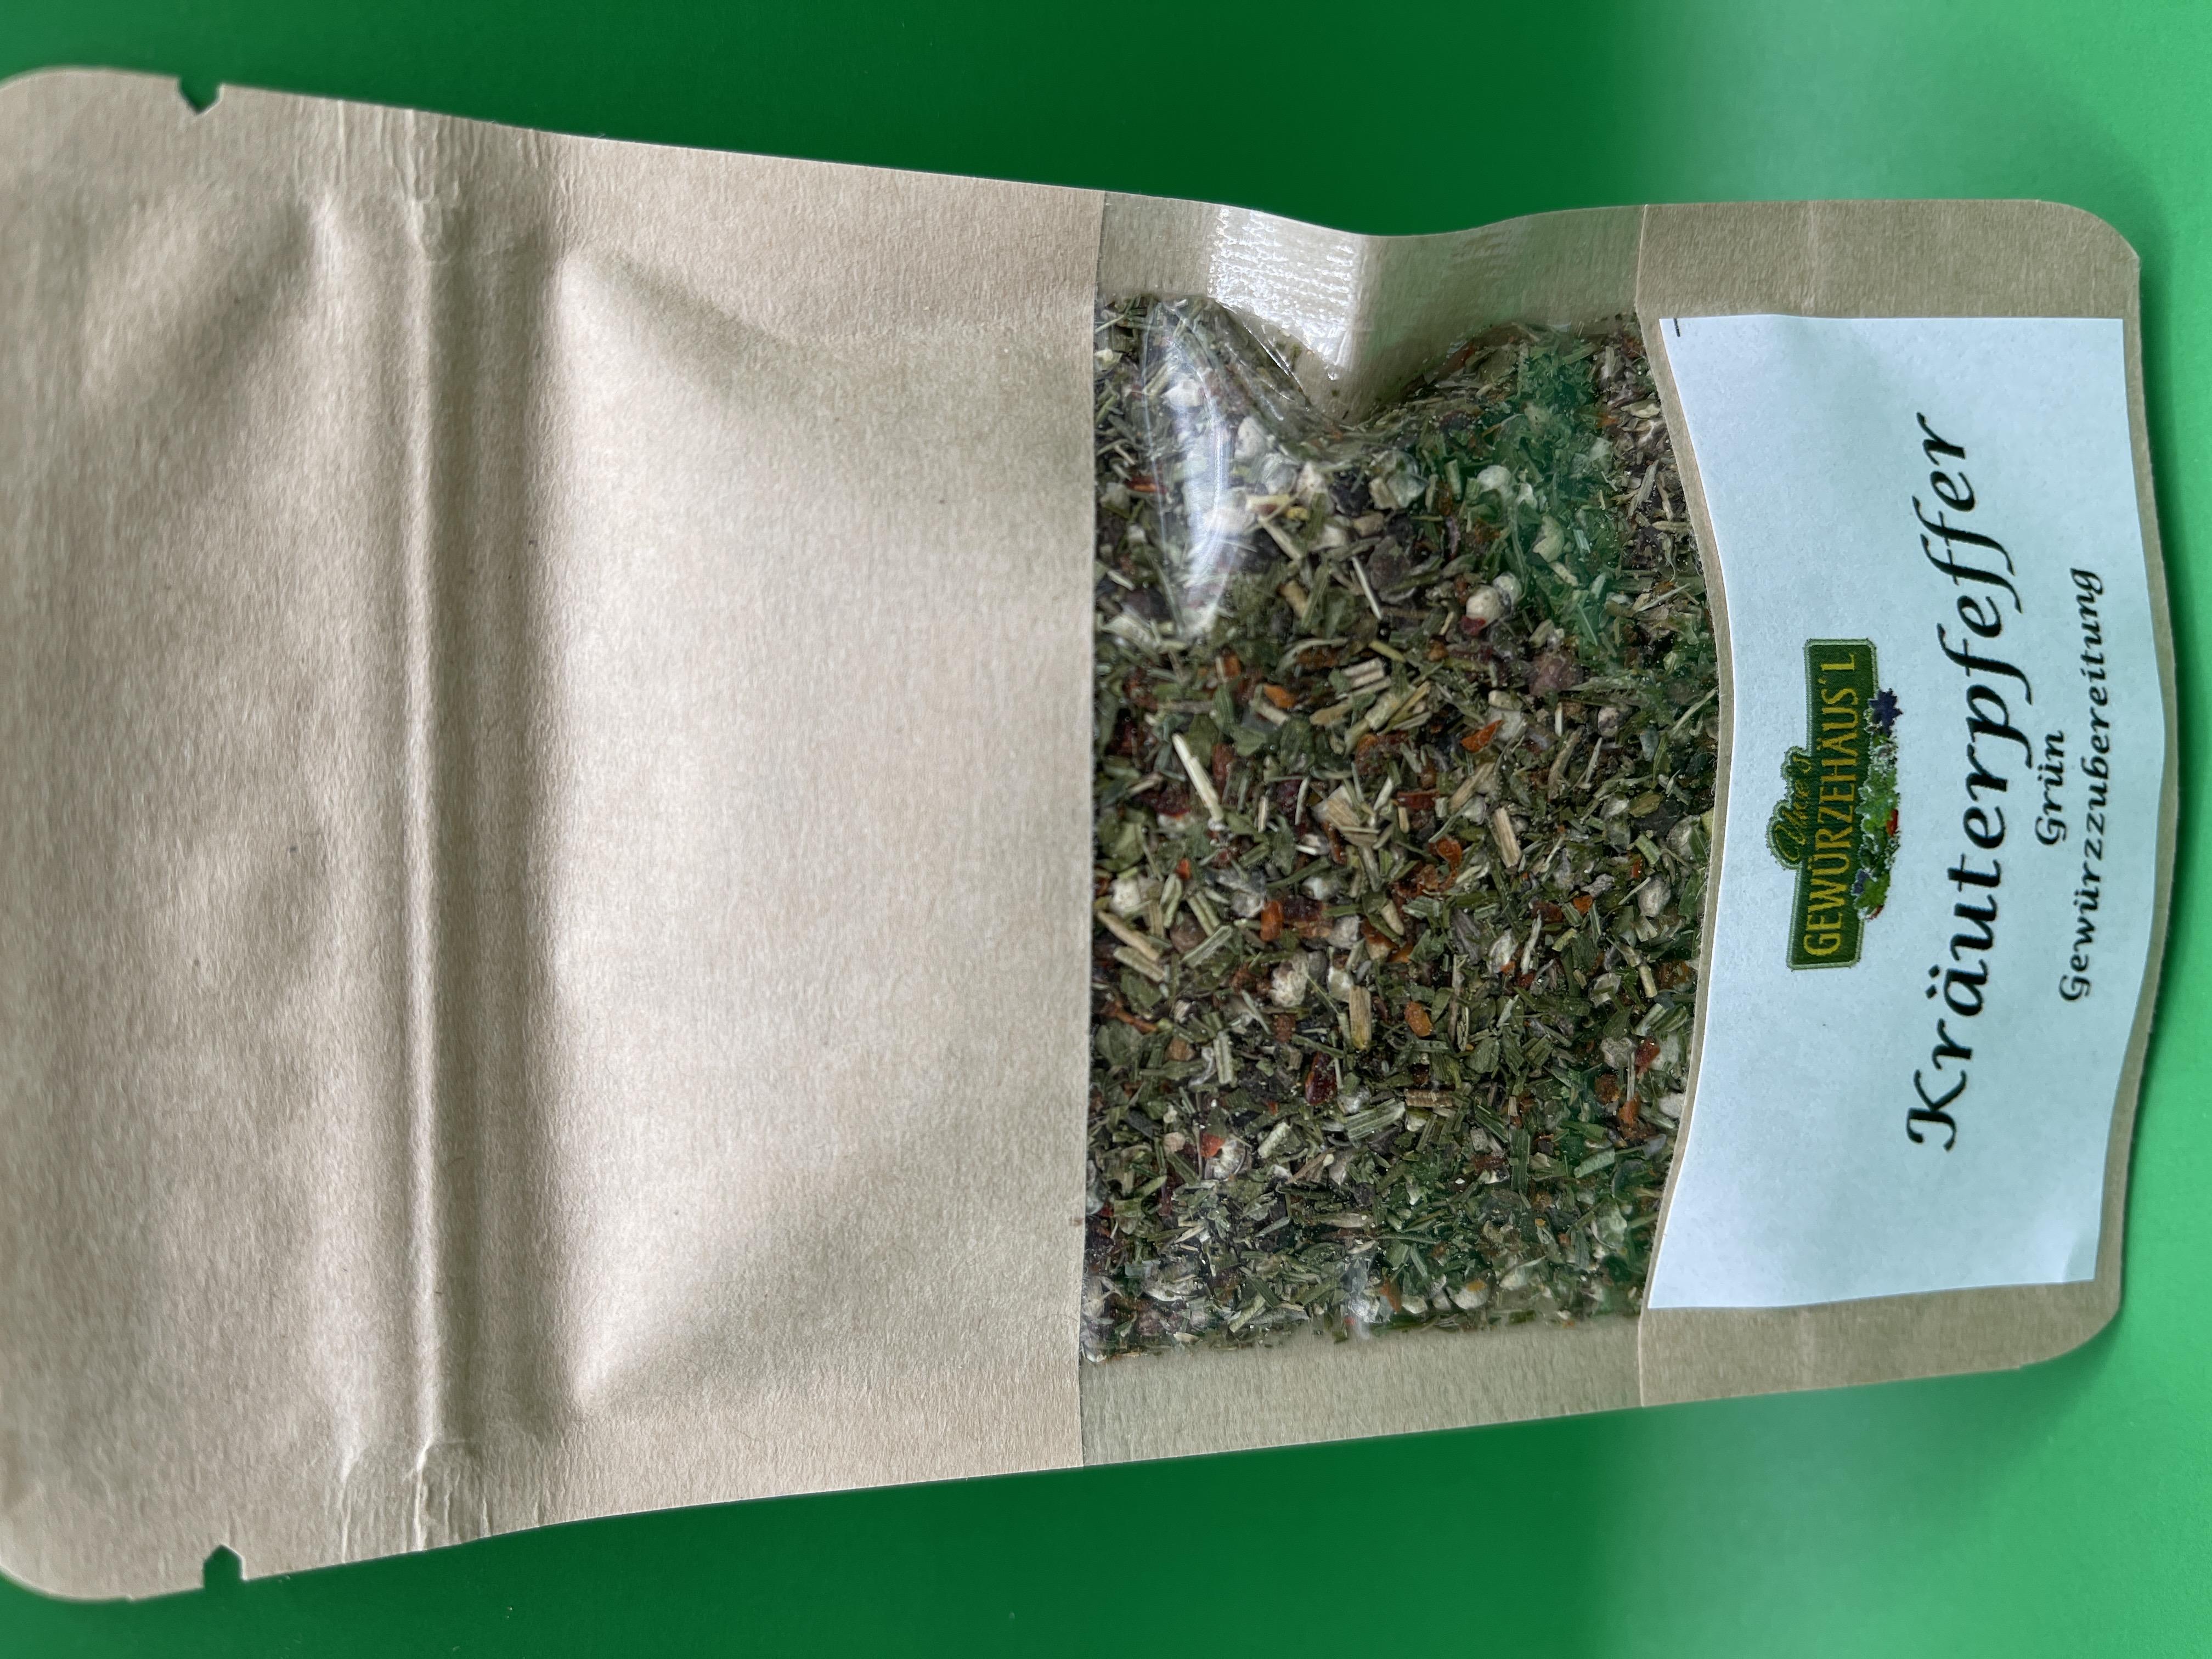 Kräuterpfeffer Grün grob 30g Gewürzmischung